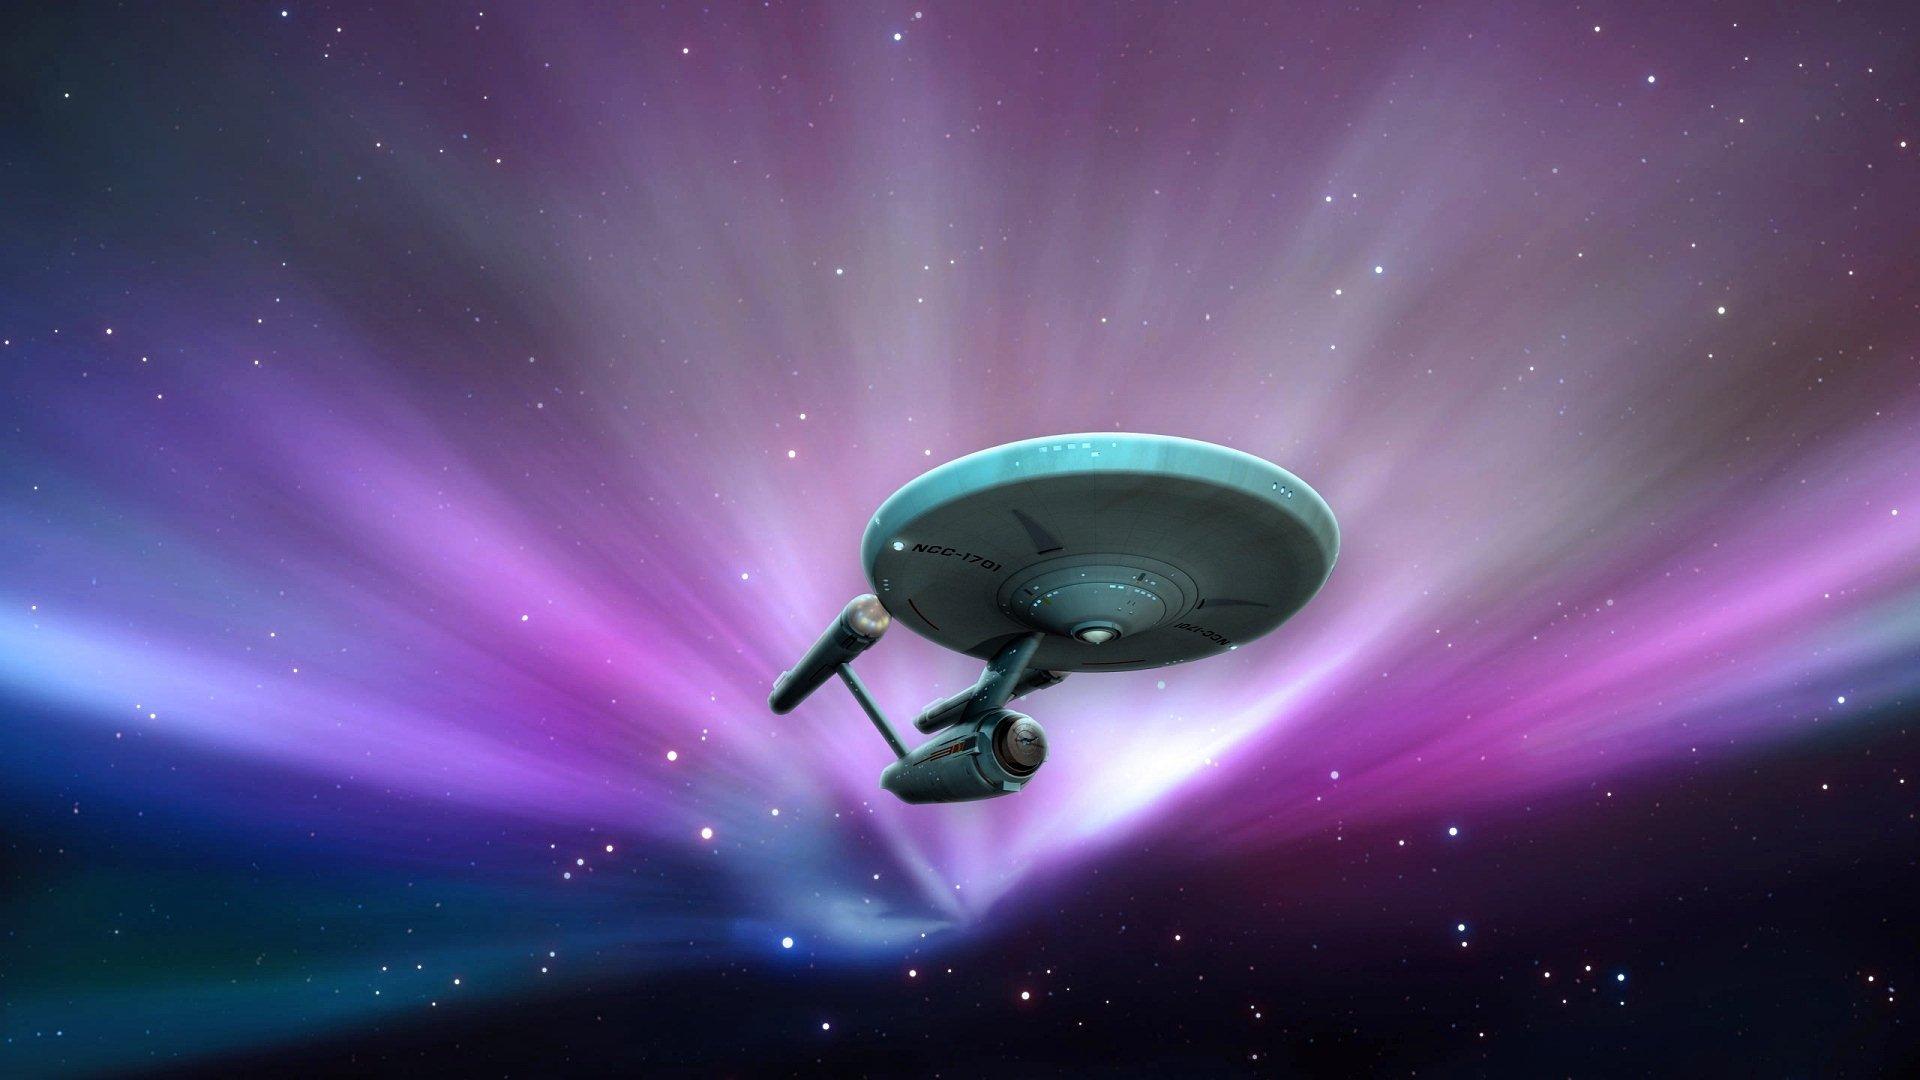 Star Trek The Original Series Hd Wallpaper Background Image